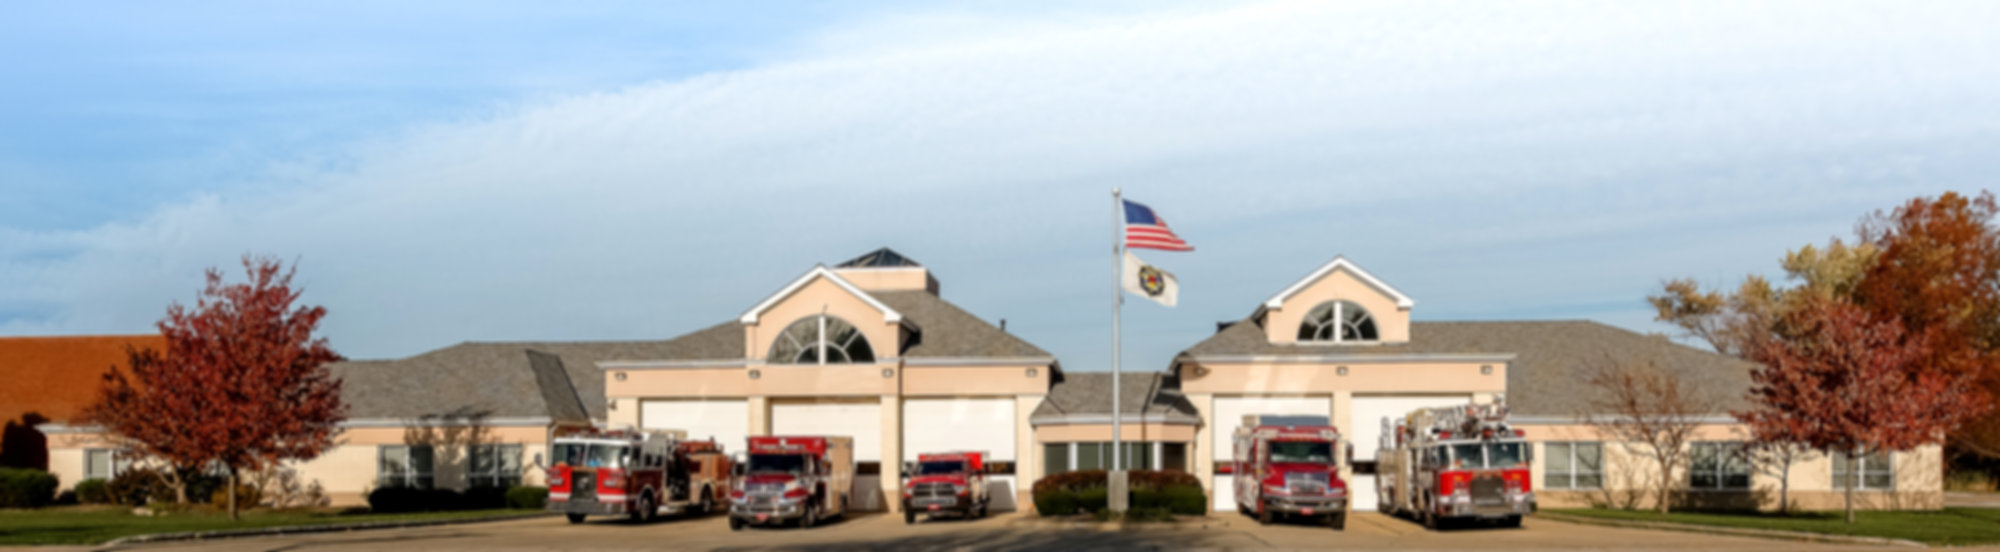 Wickliffe Fire Department